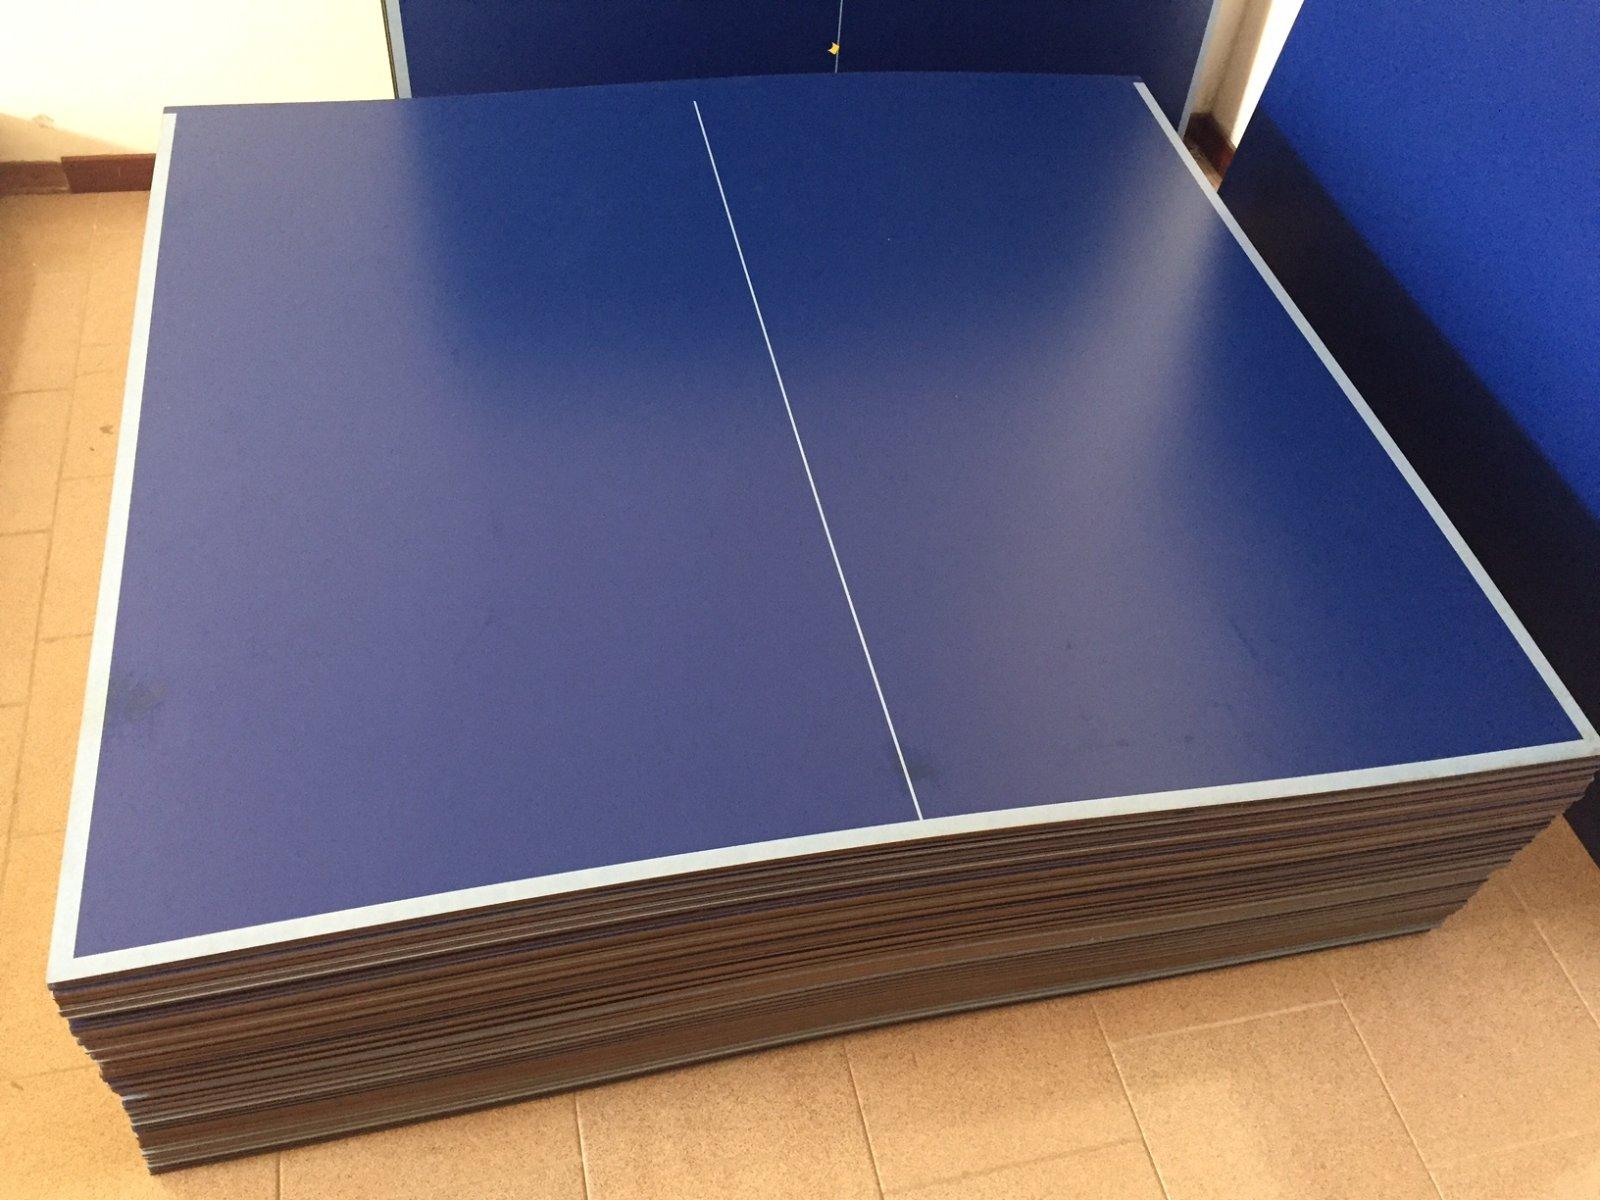 Coppia basi piani pannelli 3 scelta tavolo ping pong - Materiale tavolo ping pong ...